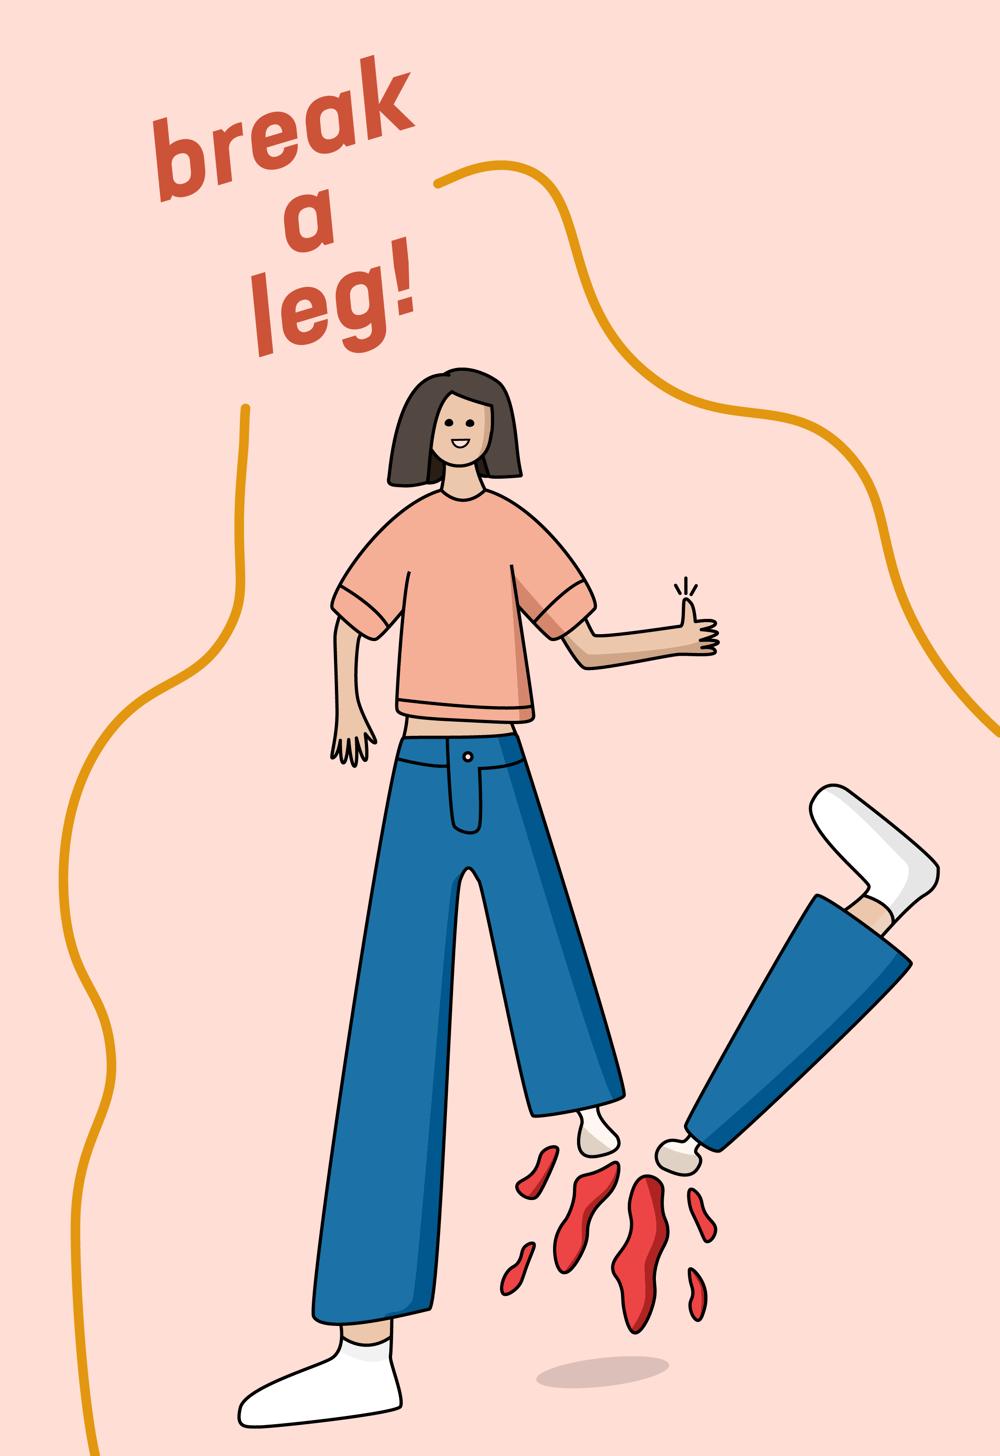 Break a leg! - image 1 - student project